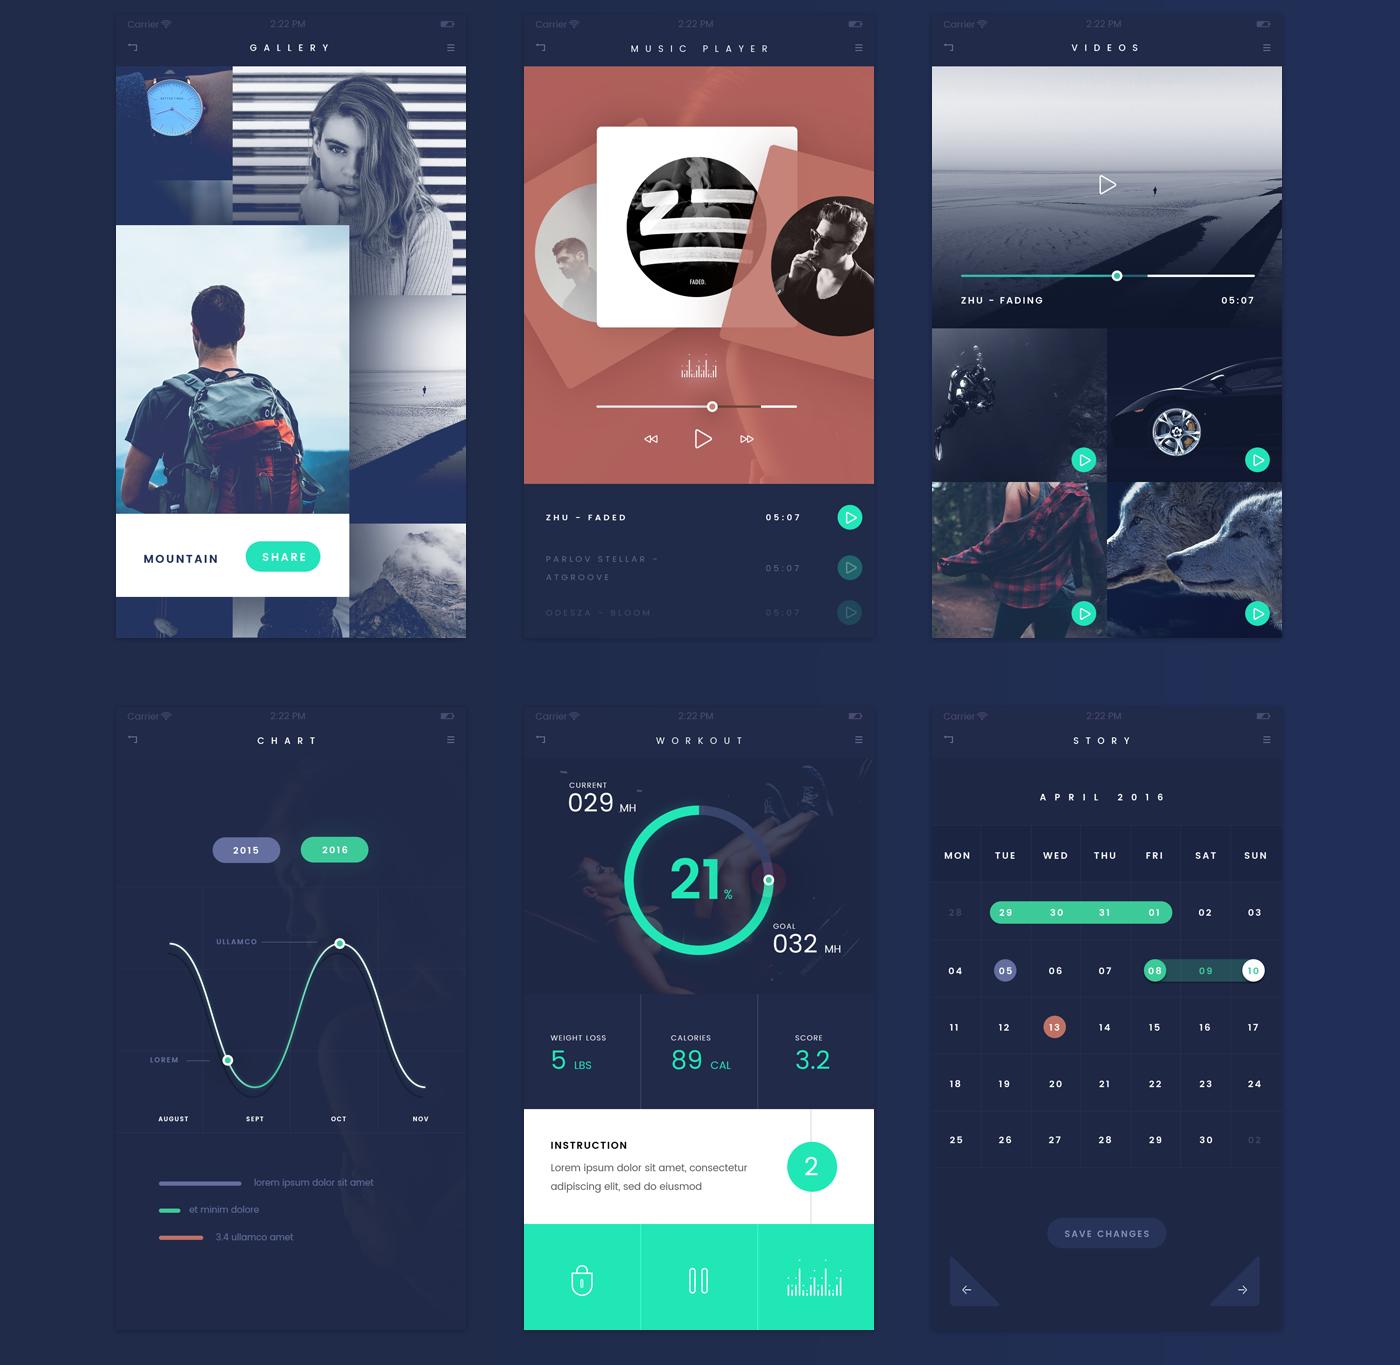 app,ios,design,ui kit,freebie,dark,elegant,flat,deep blue,green,orange,Mockup,prototype